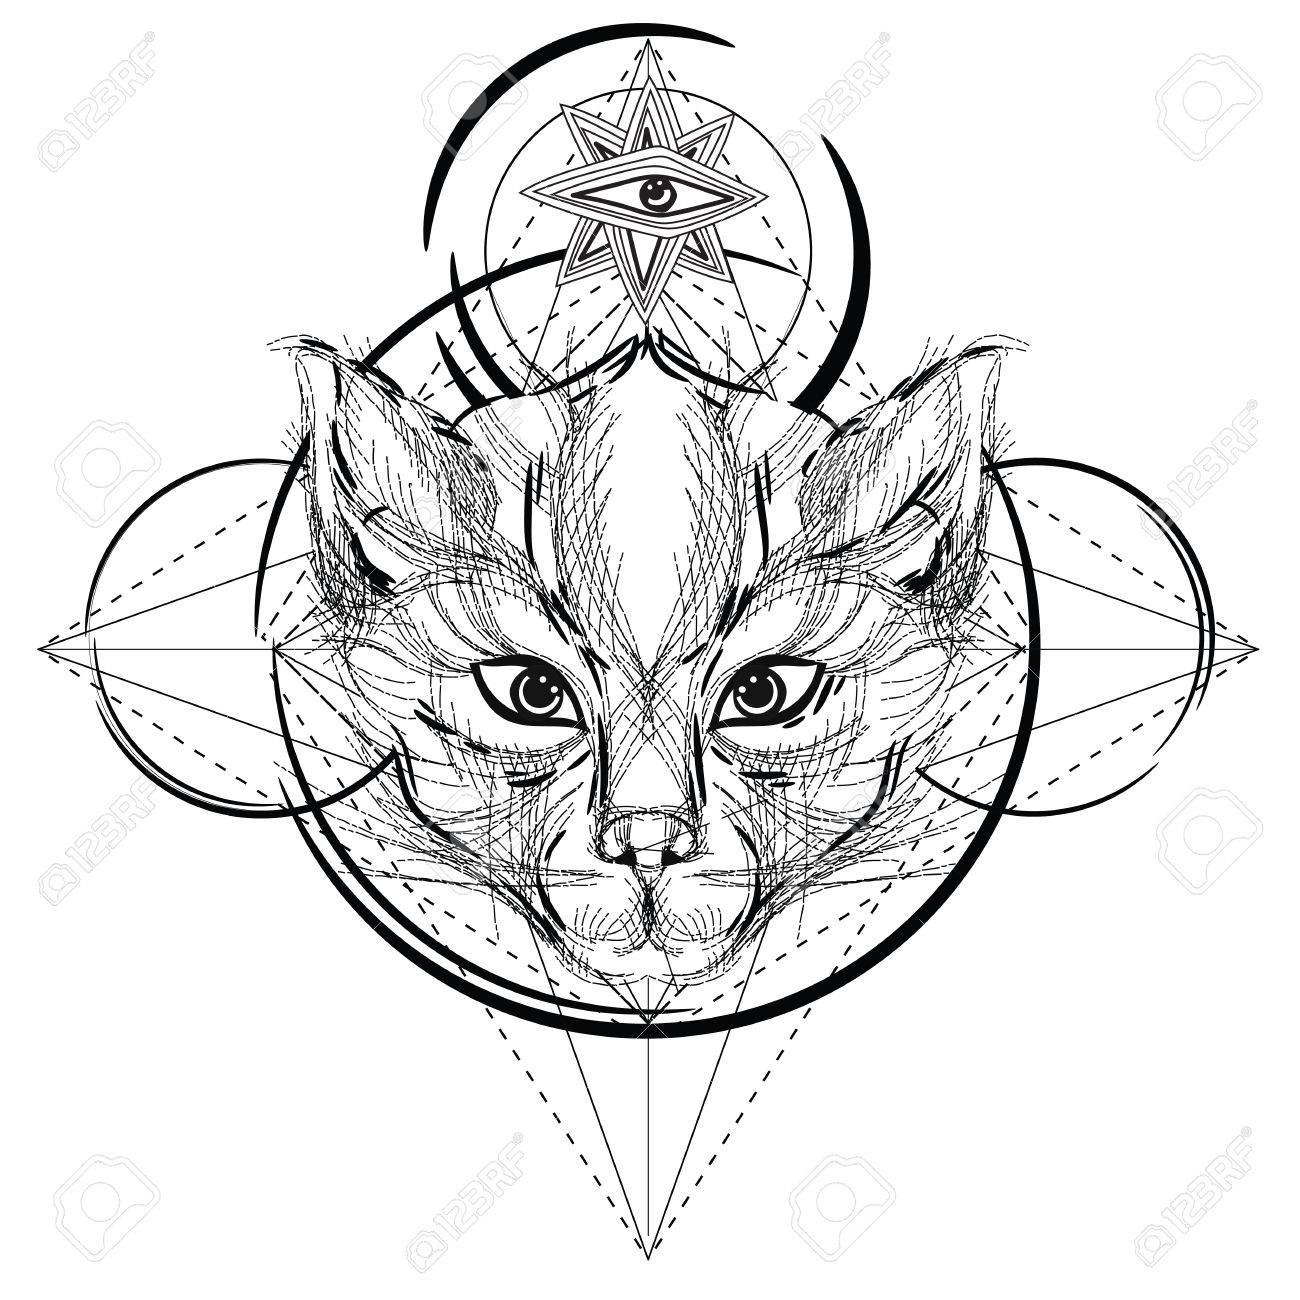 Coloriage Anti Stress Mode.Icone Triangulaire Tete Animale Conception De Ligne Geometrique A